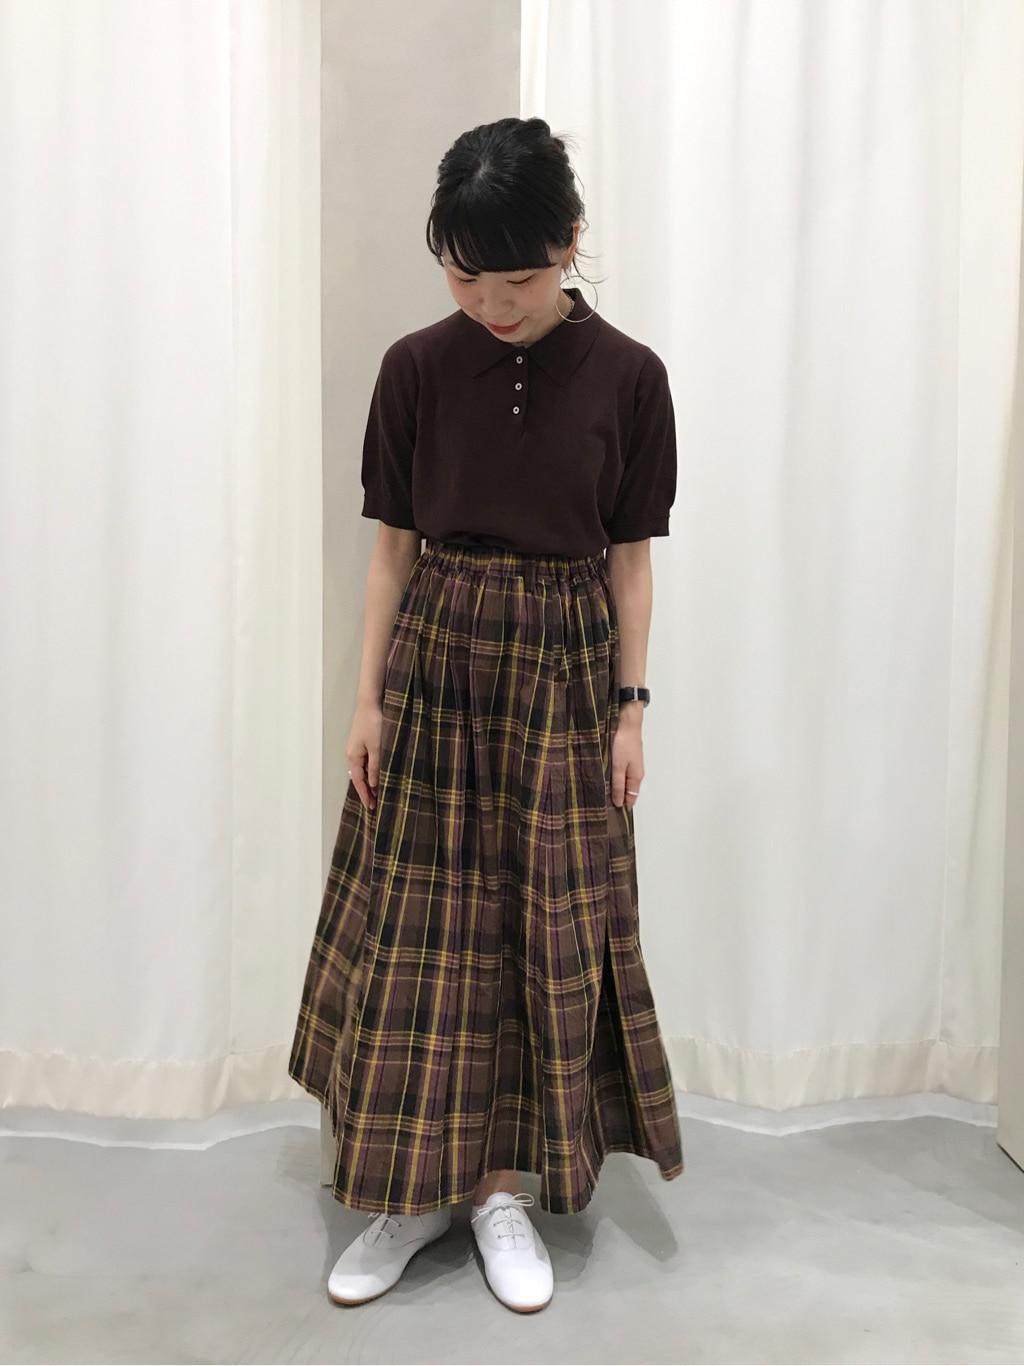 AMB SHOP PAR ICI CHILD WOMAN , PAR ICI 東京スカイツリータウン・ソラマチ 身長:154cm 2020.07.01